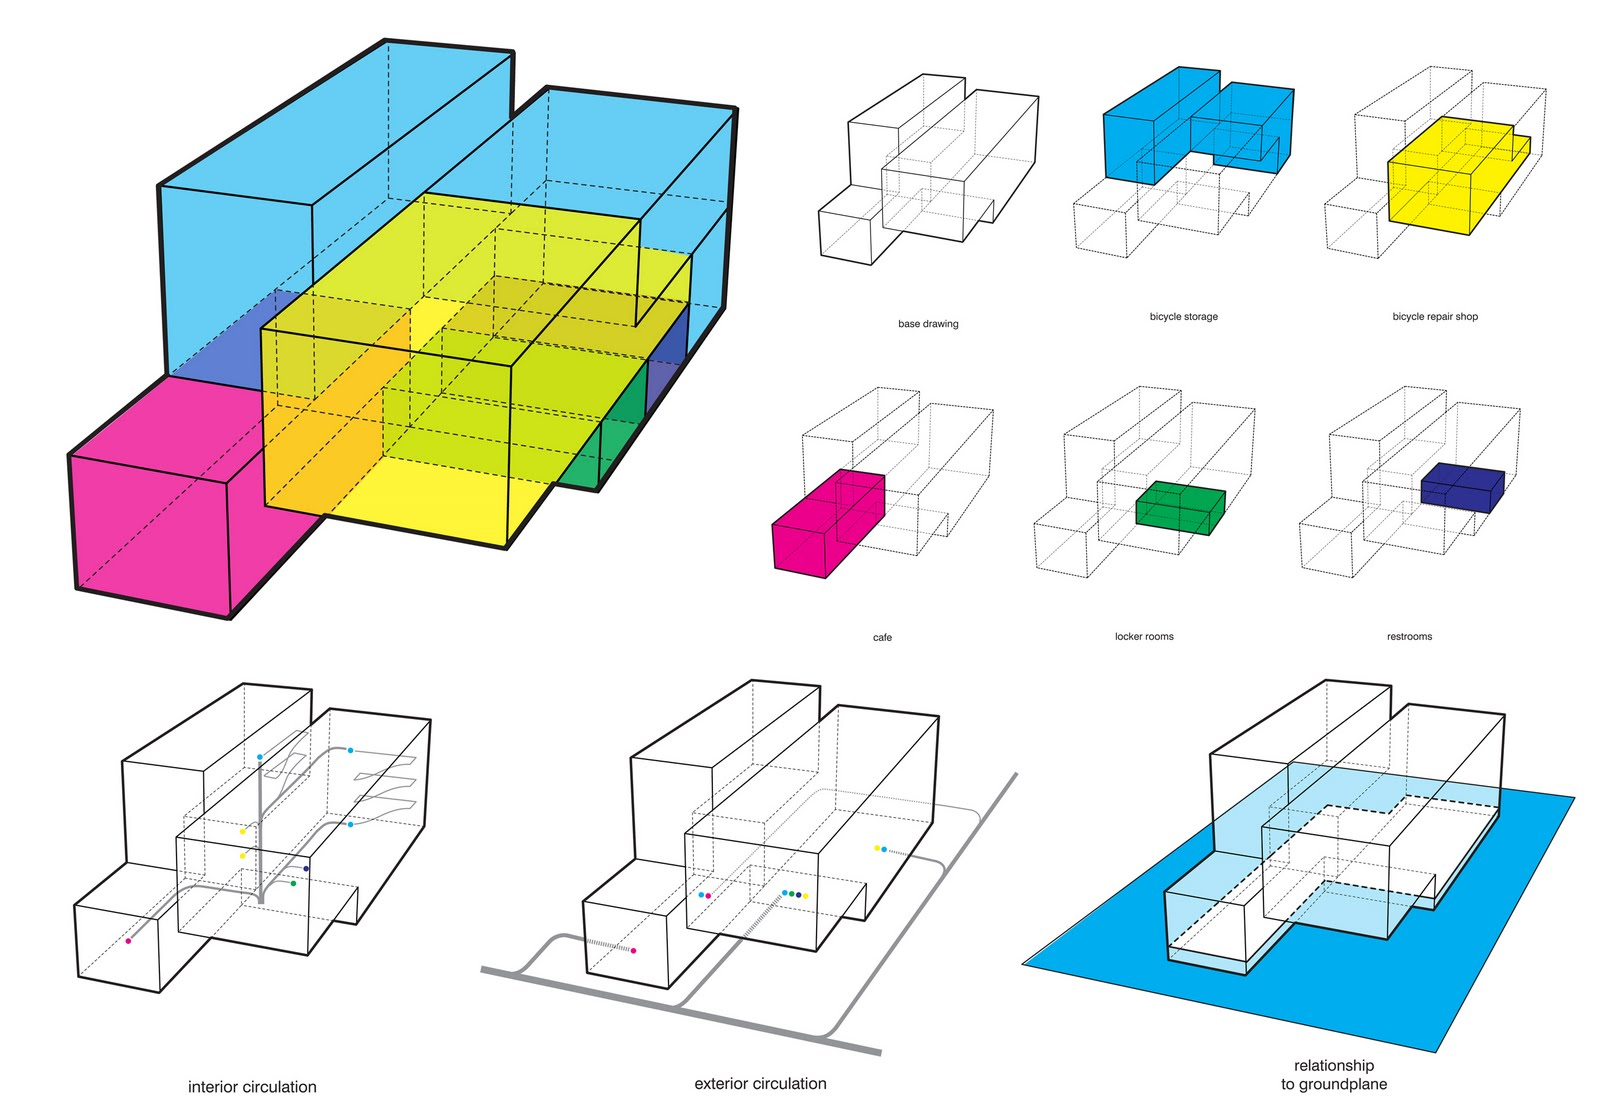 Free Tool To Draw Architecture Diagram Healthy Diet Program  Sjögareds Såg Och Byggmaterial